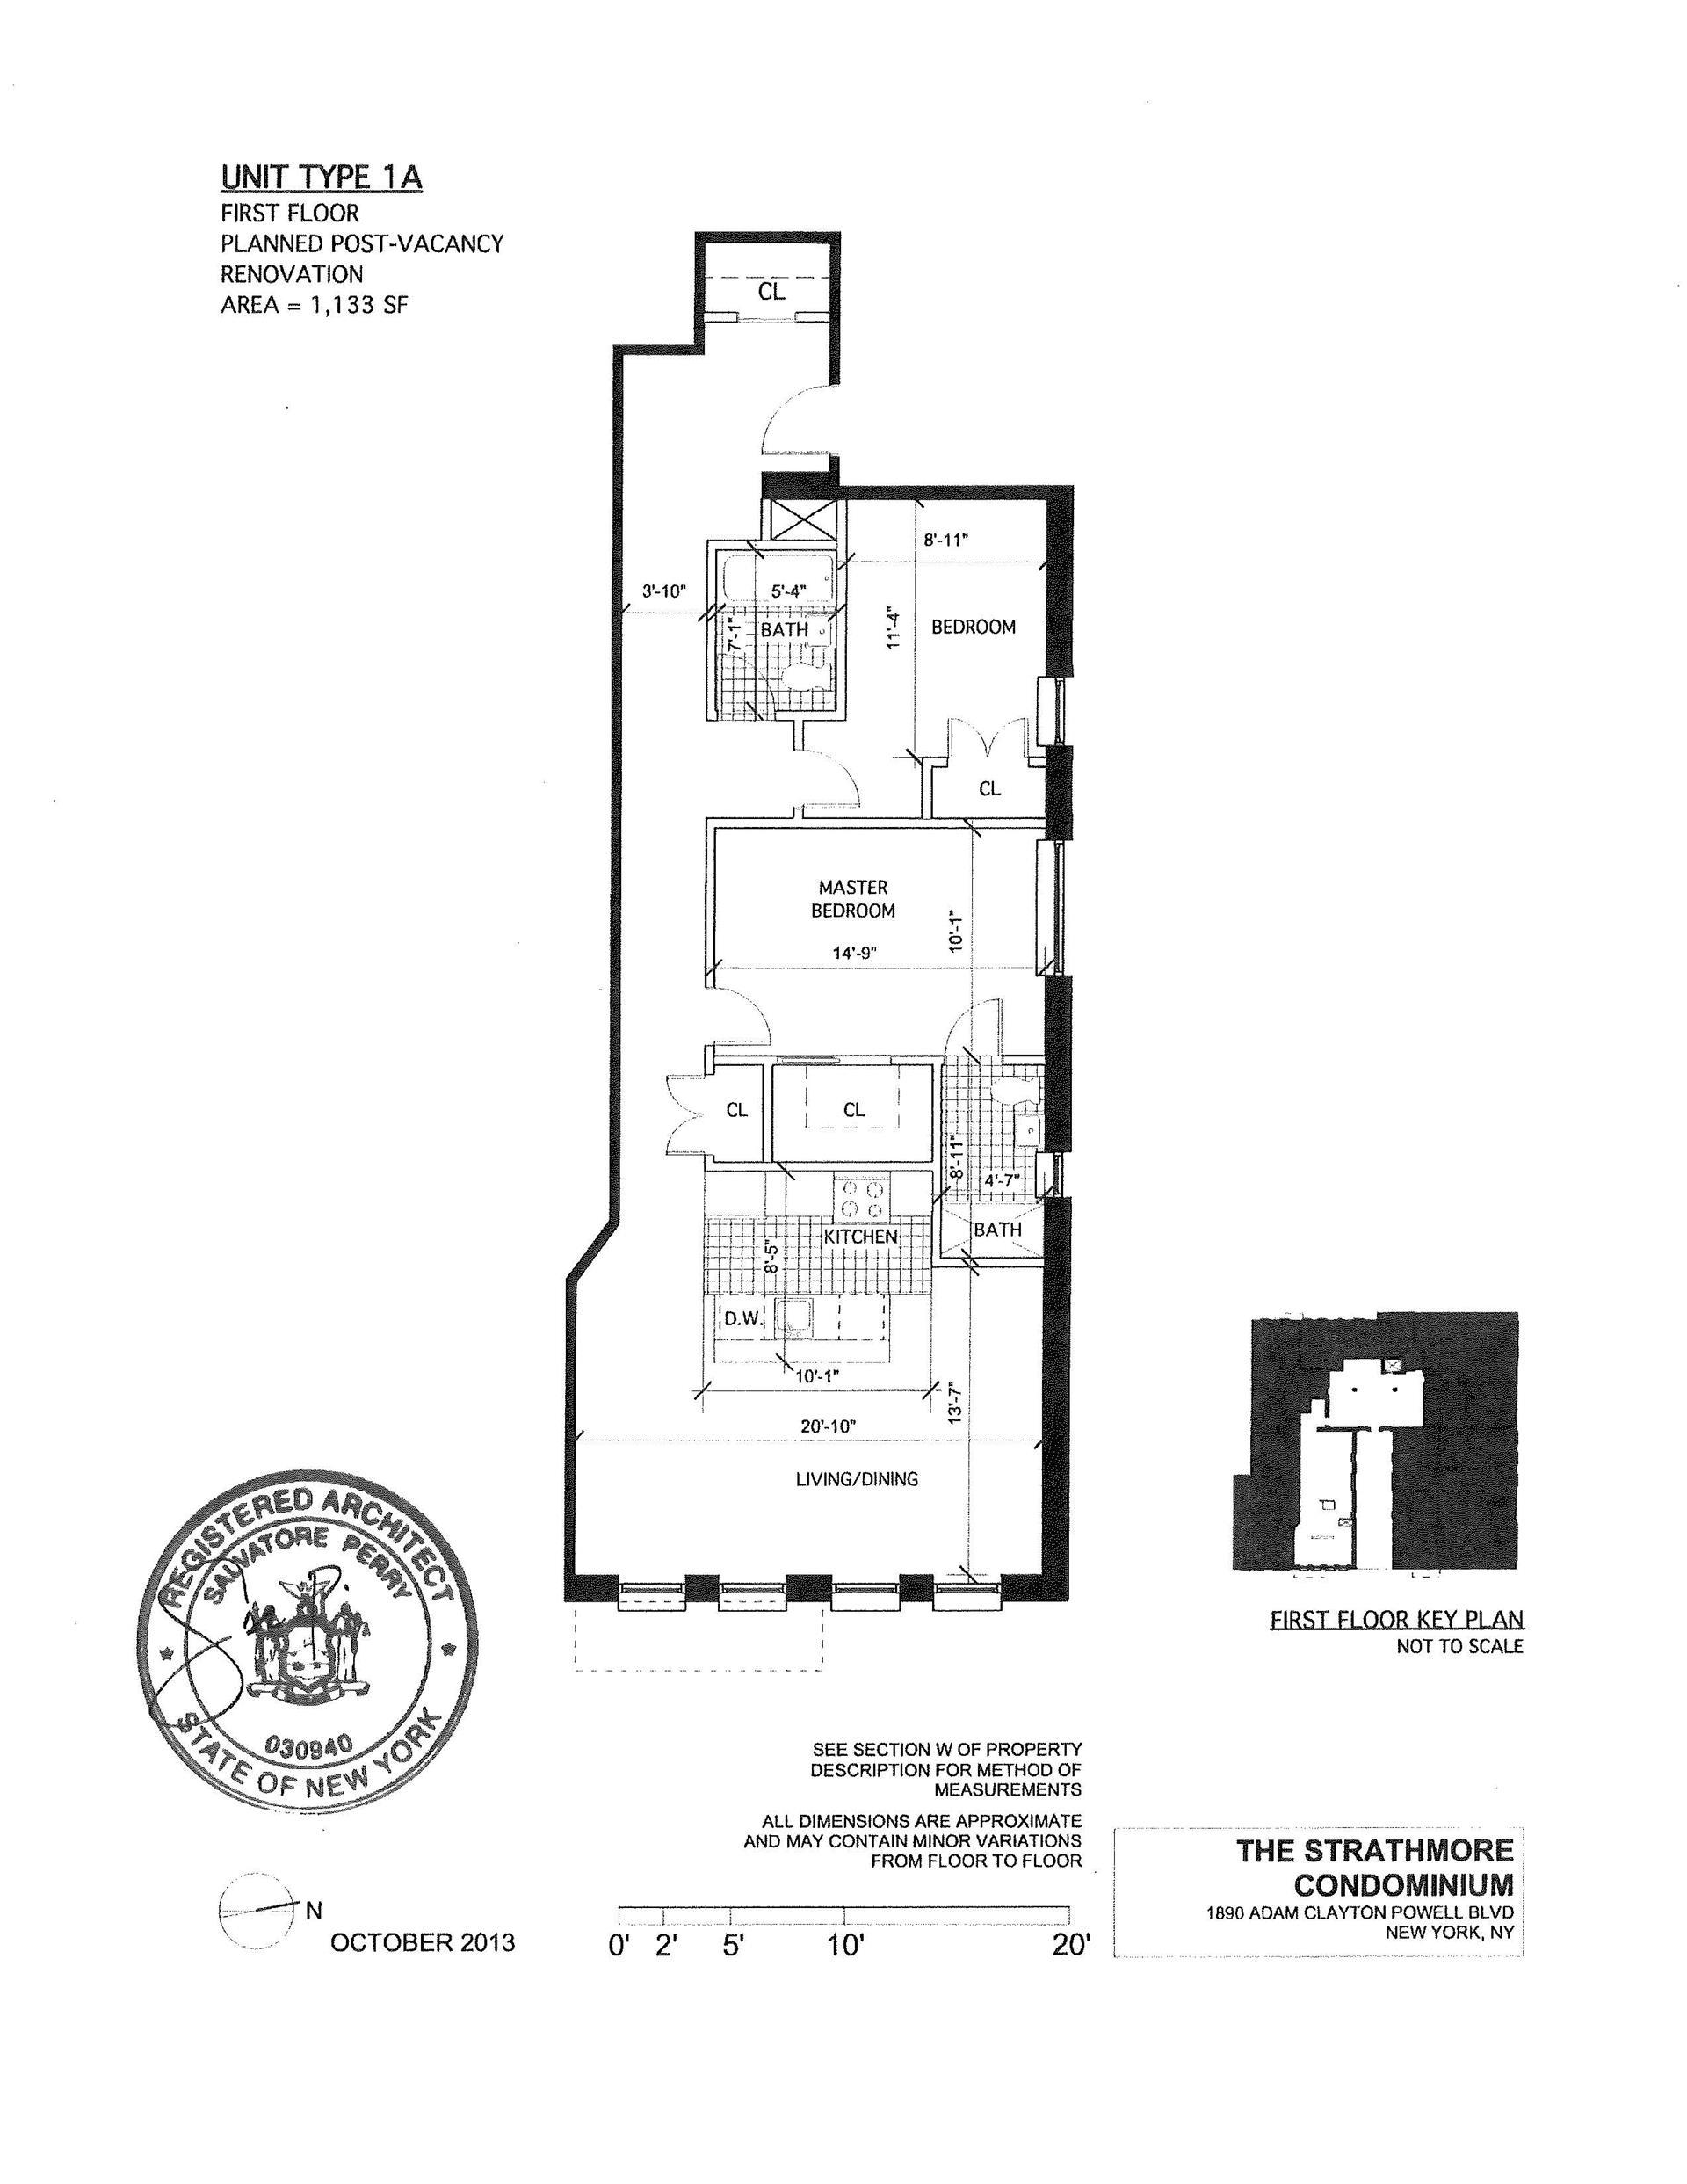 Floor plan of The Strathmore, 1890 Adam C Powell Boulevard, 1A - Harlem, New York